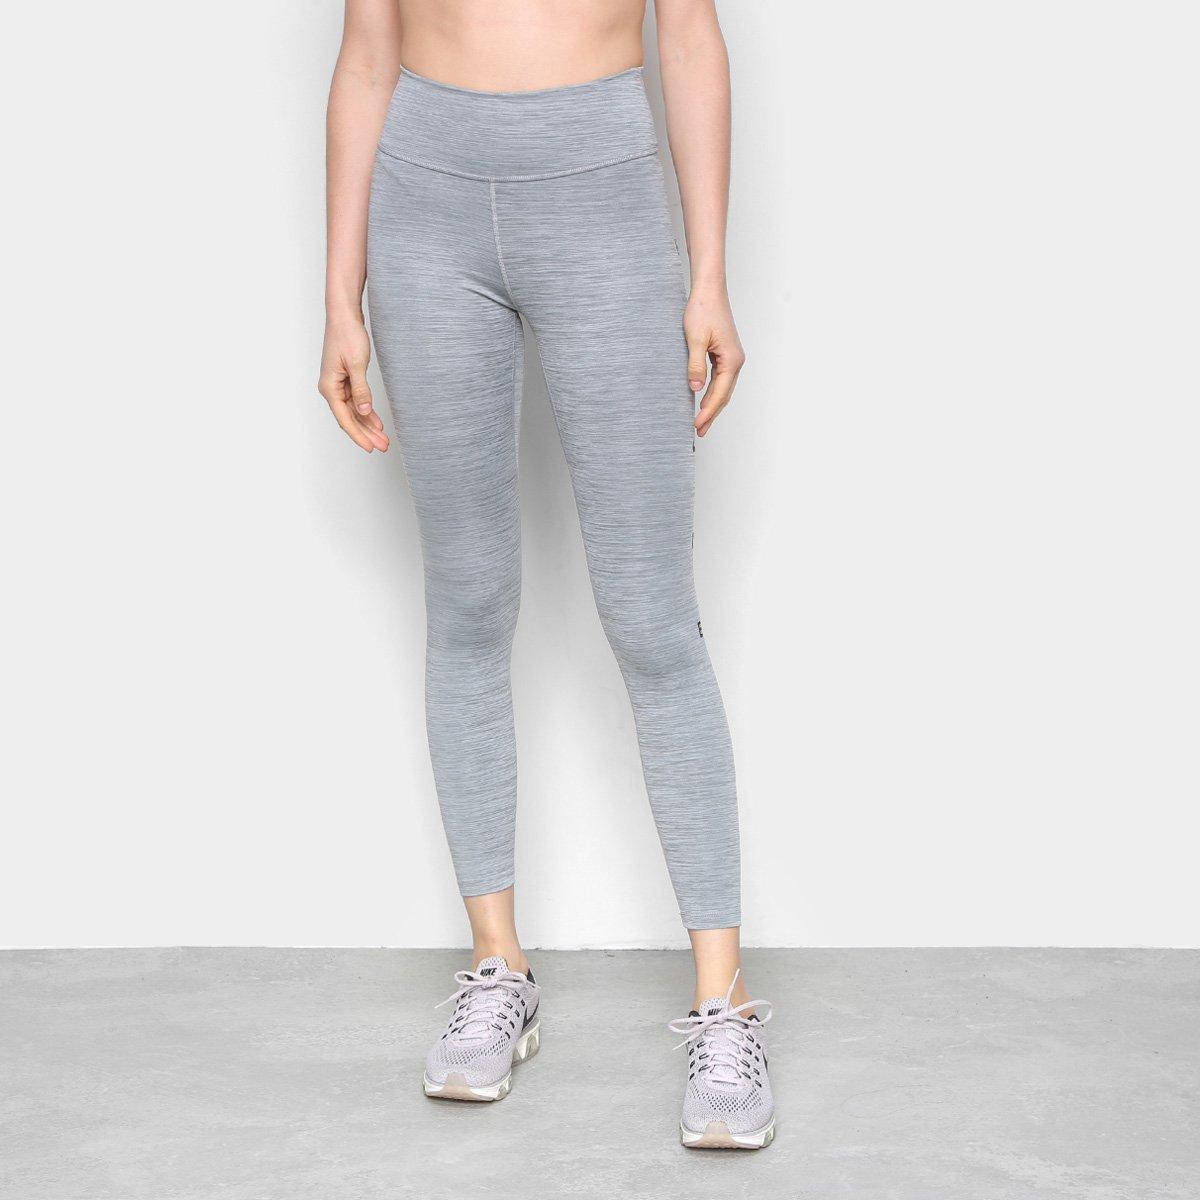 Calça Legging Nike One 7/8 Feminina